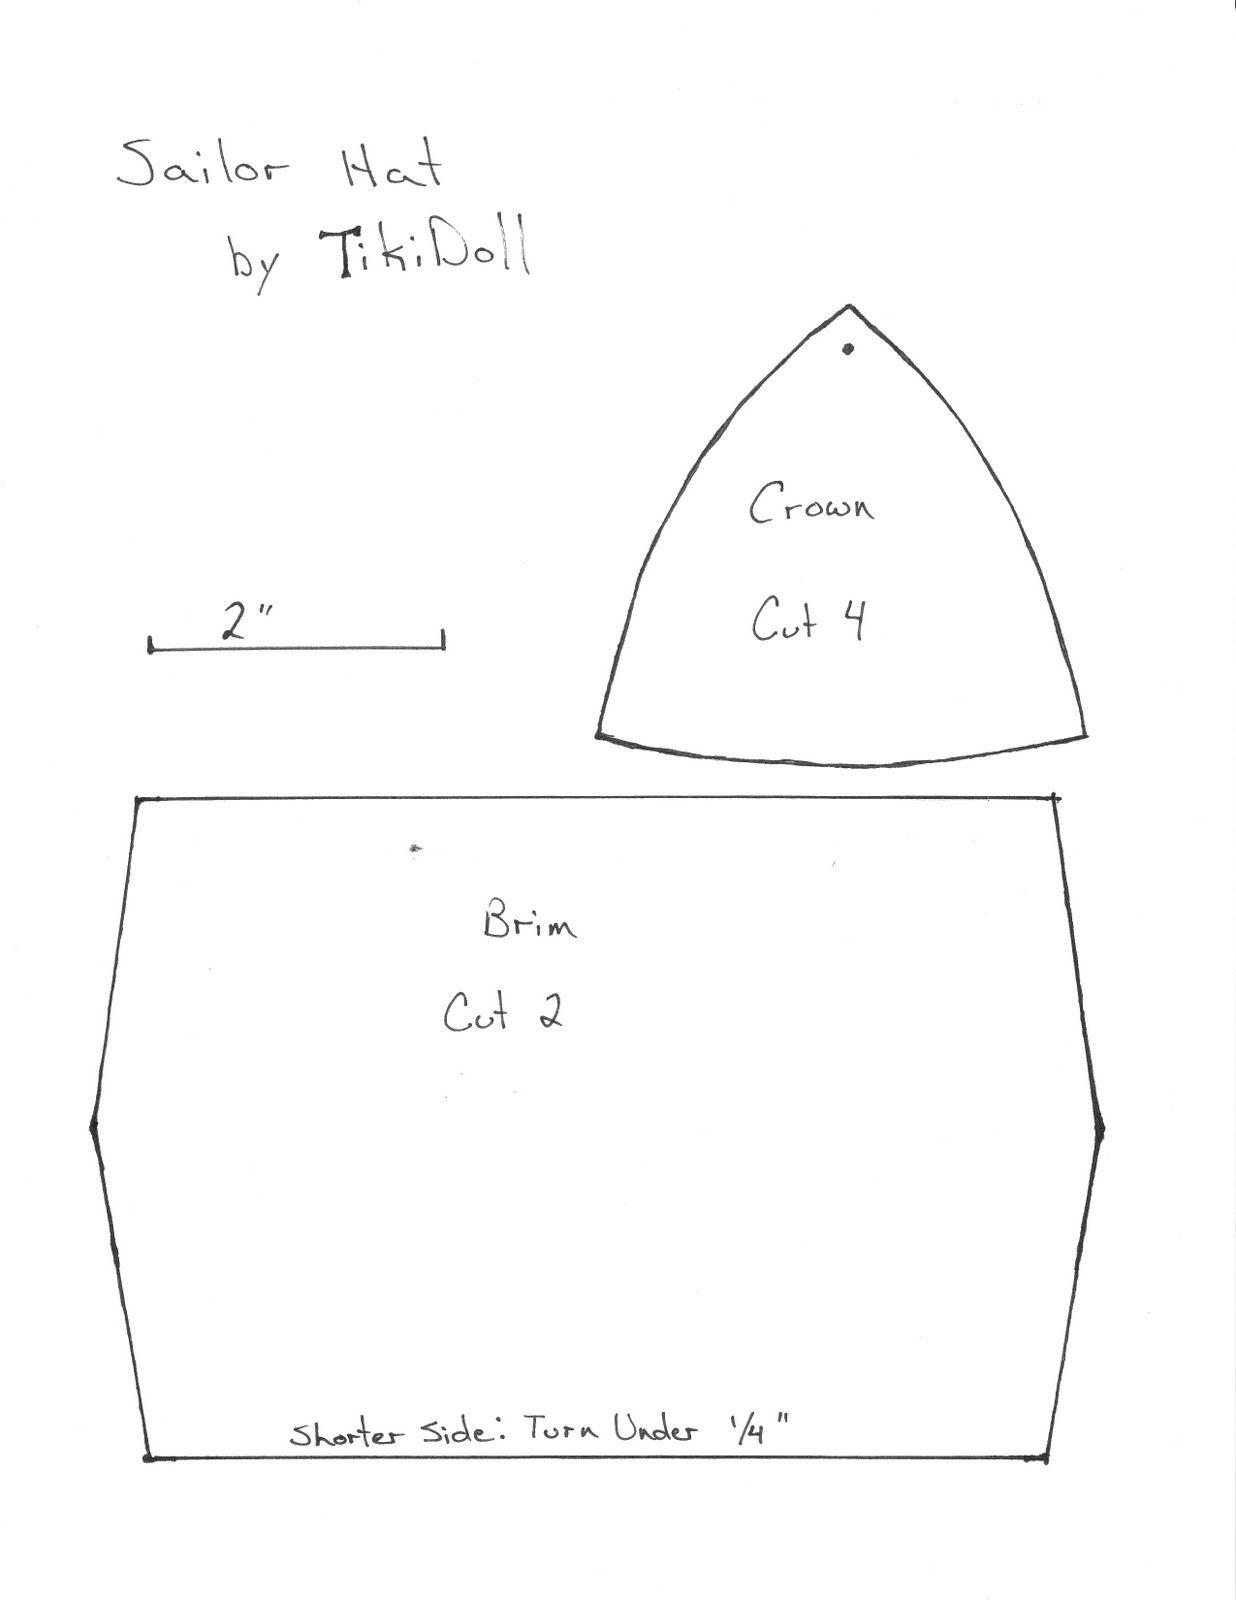 Cmo hacer un sombrero de marinero redondo 2 ideas bonitas tikidoll dance sailor hat pattern and instructions jeuxipadfo Choice Image